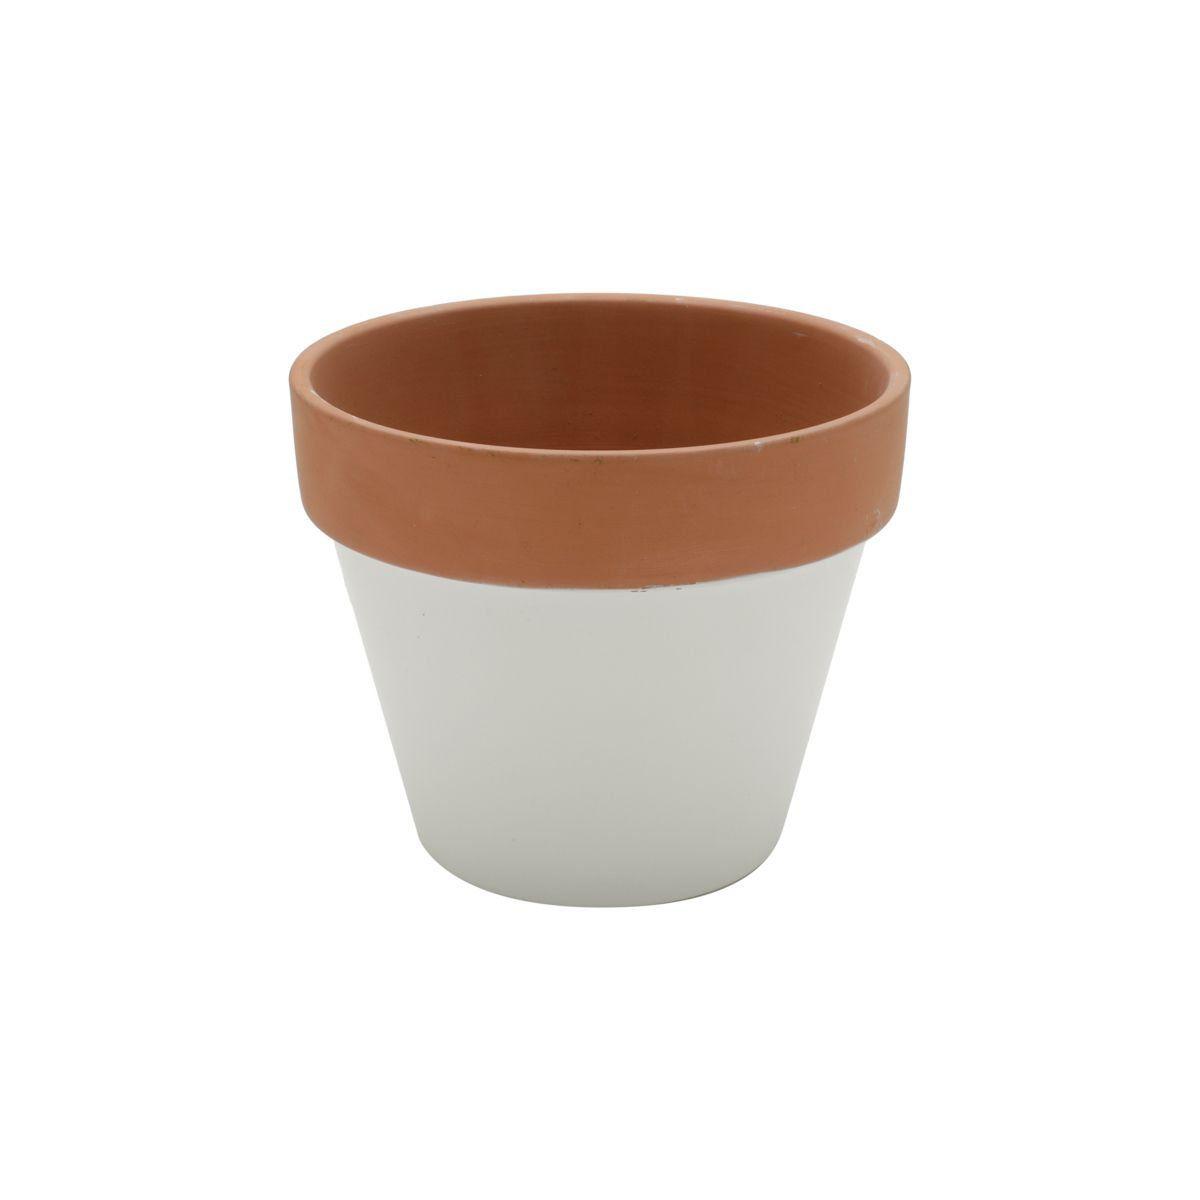 Vaso de Cerâmica Branco com Borda Terracota Grande 12,5cm x 15cm - 42858